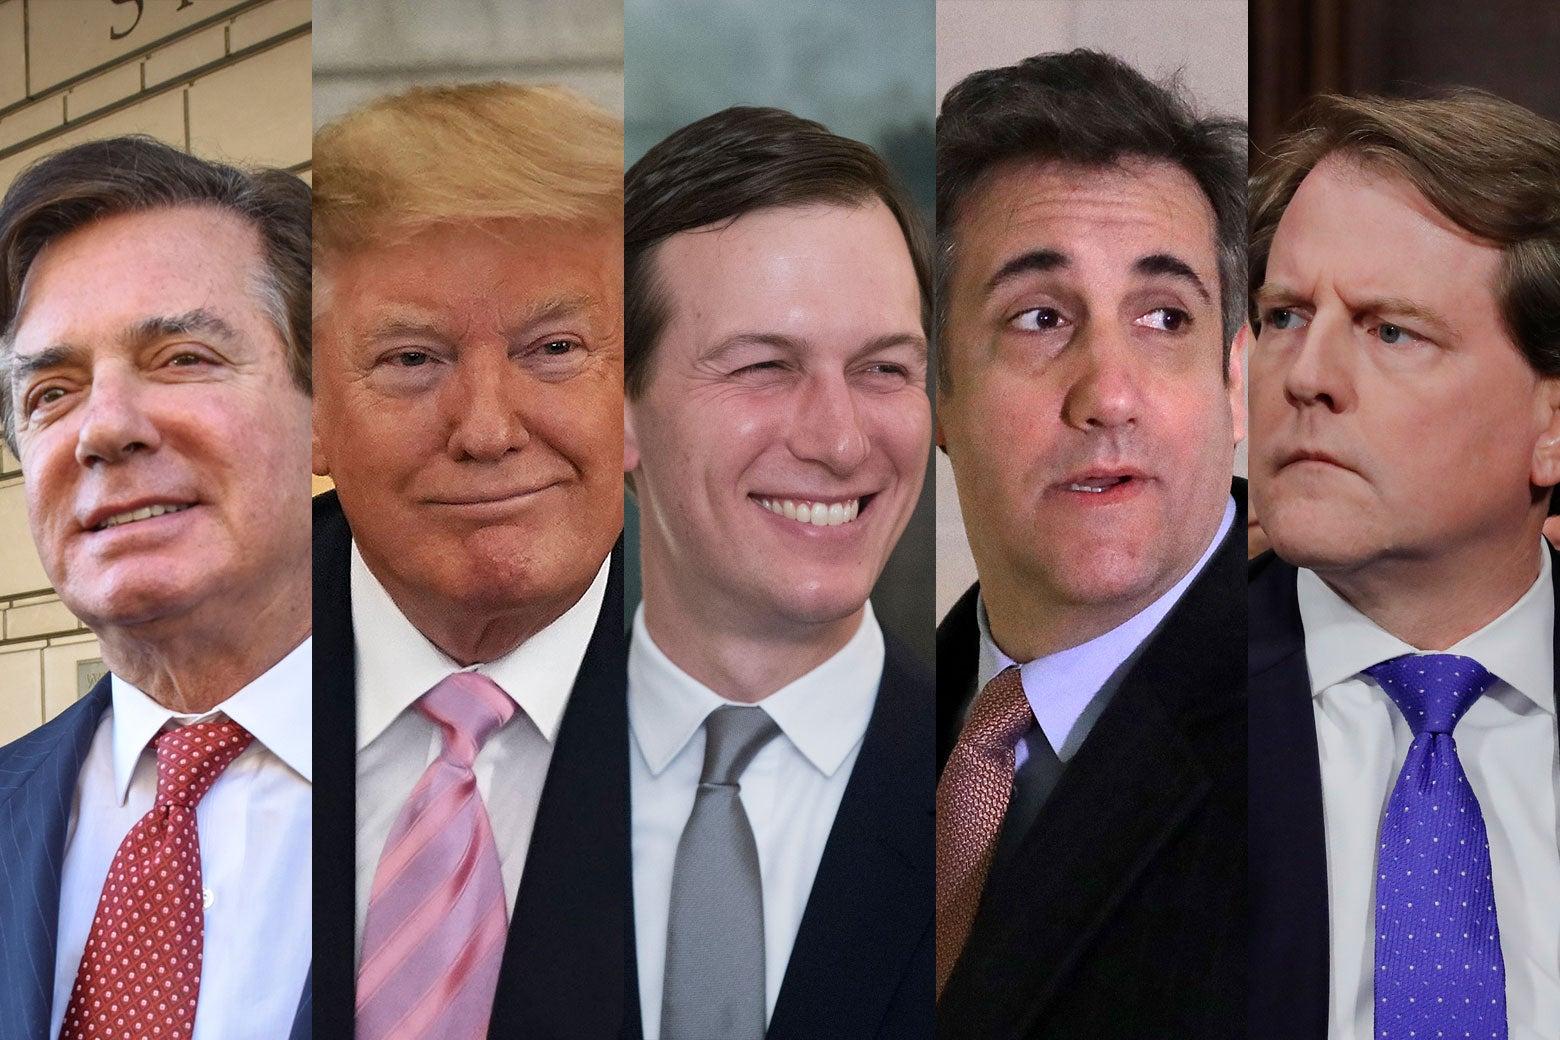 Paul Manafort, Donald Trump, Jared Kushner, Michael Cohen, and Don McGahn.